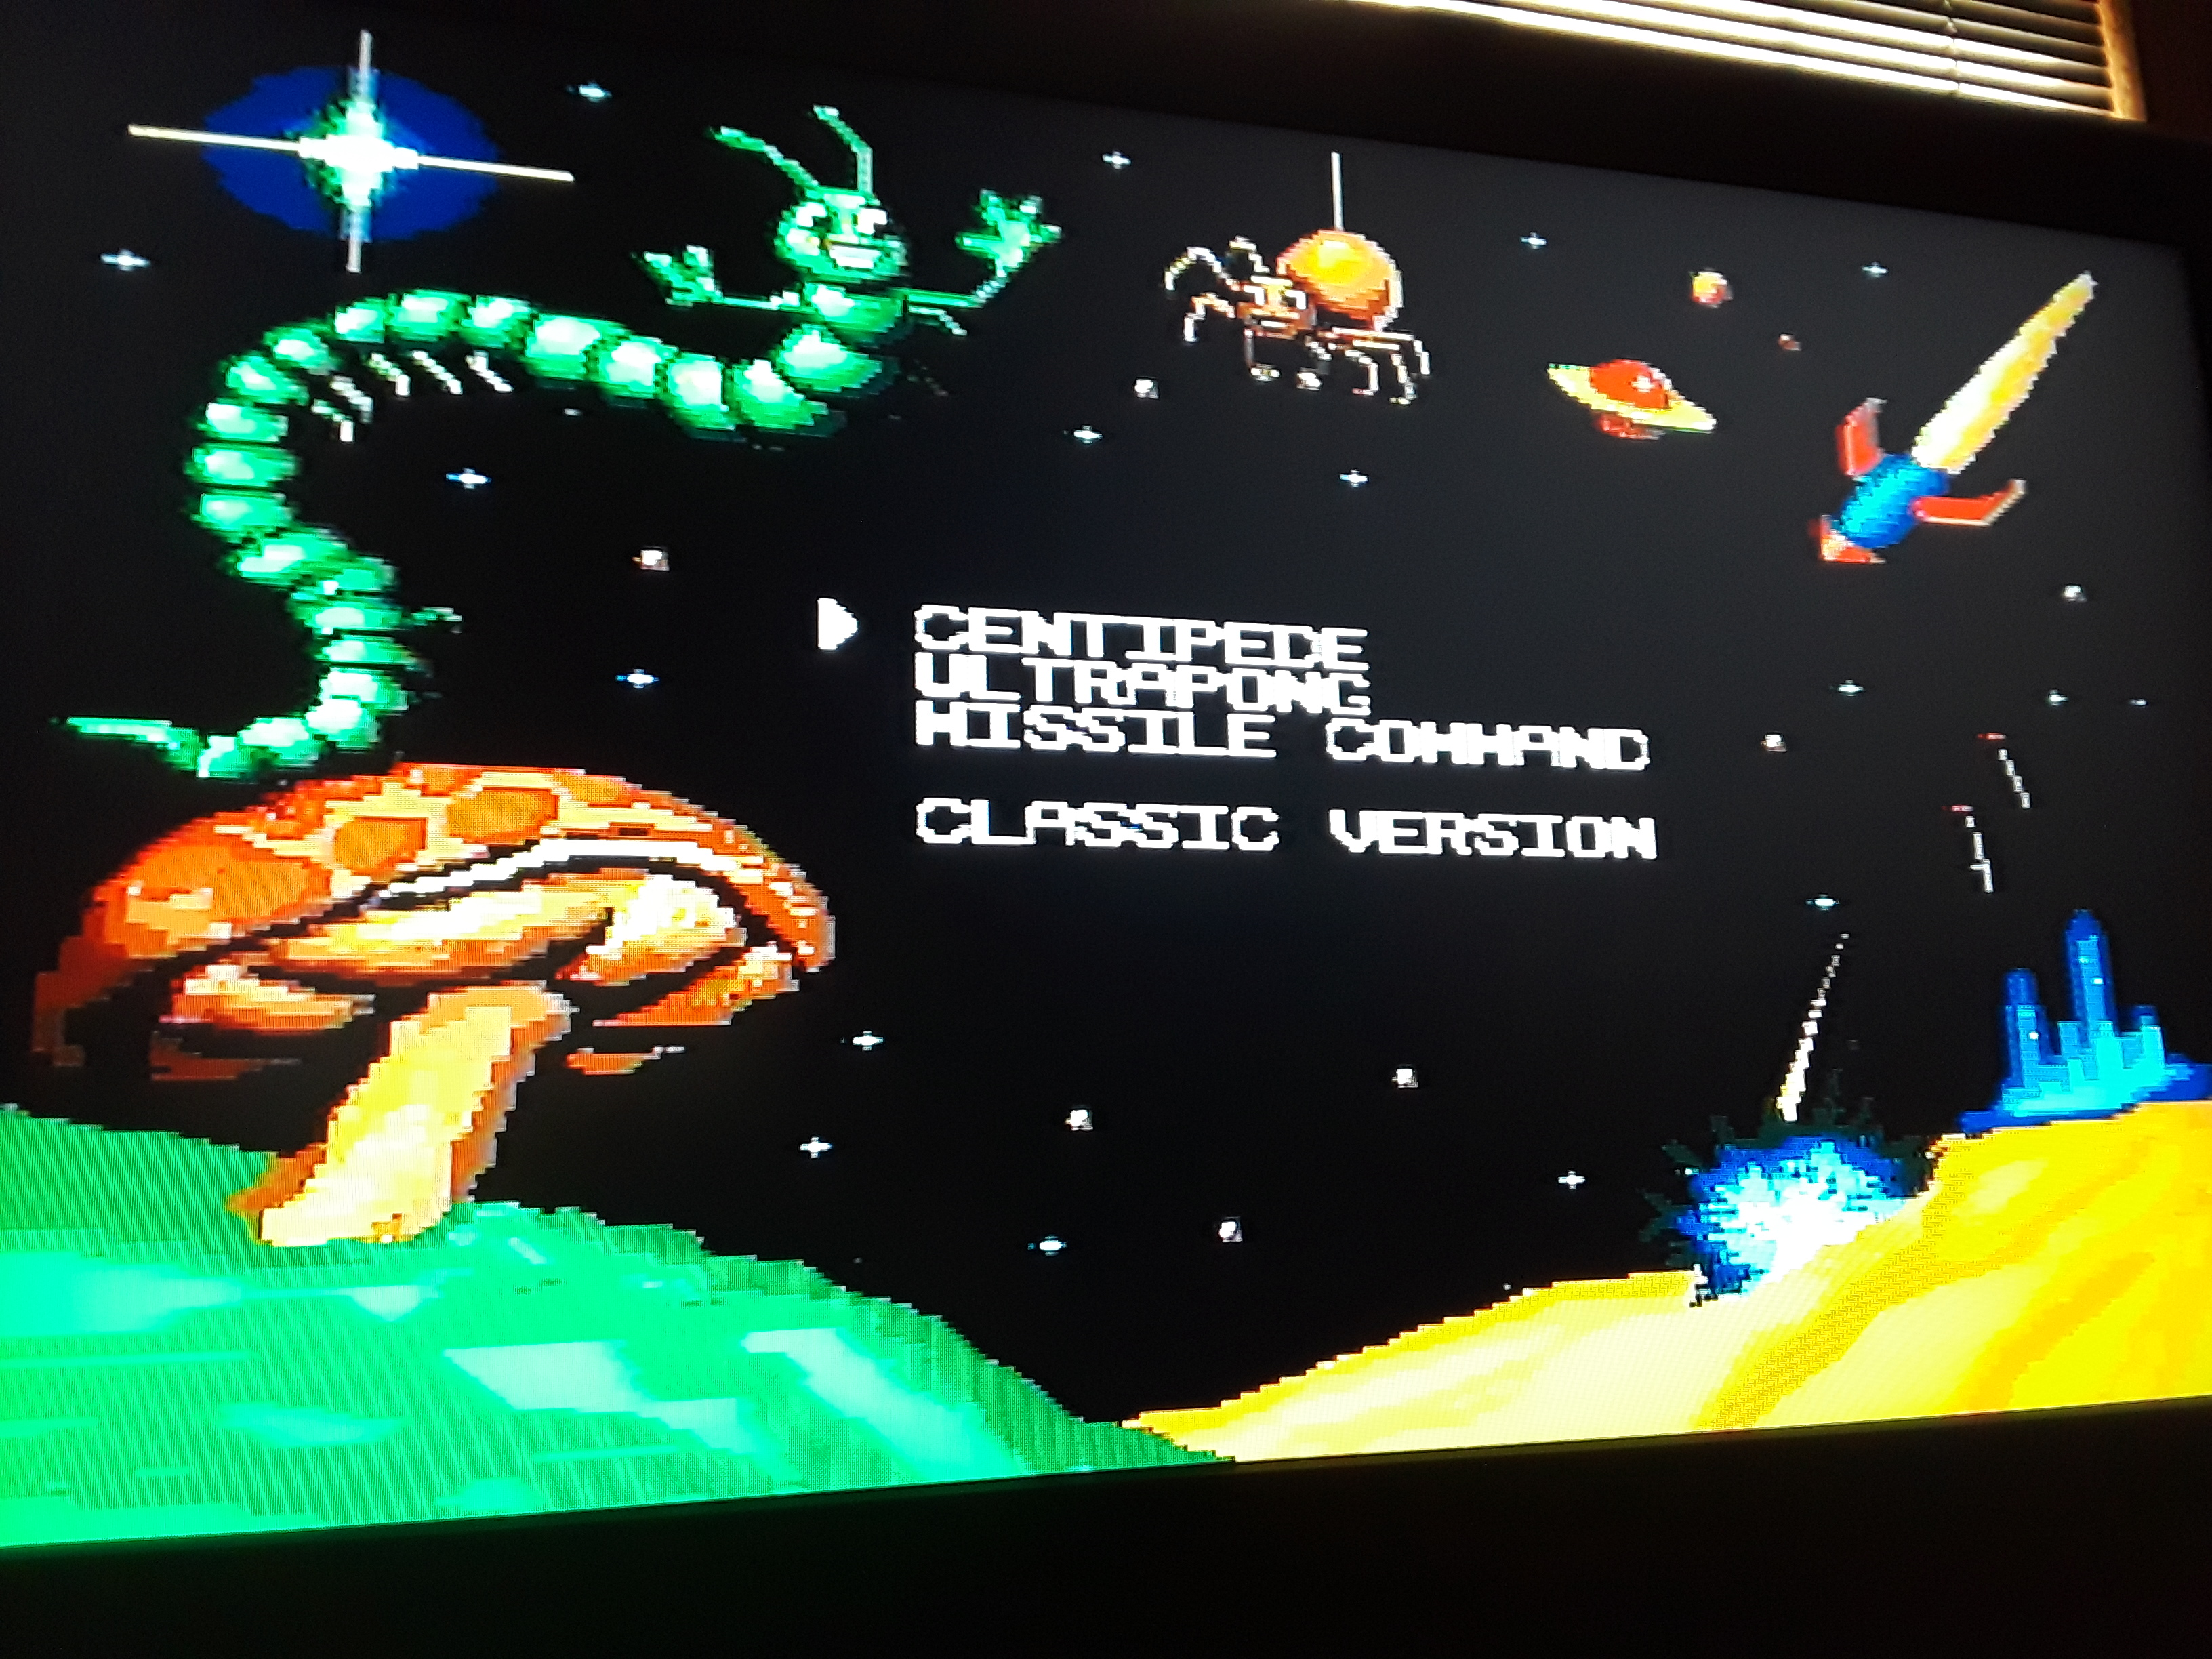 Arcade Classics: Centipede 10,150 points